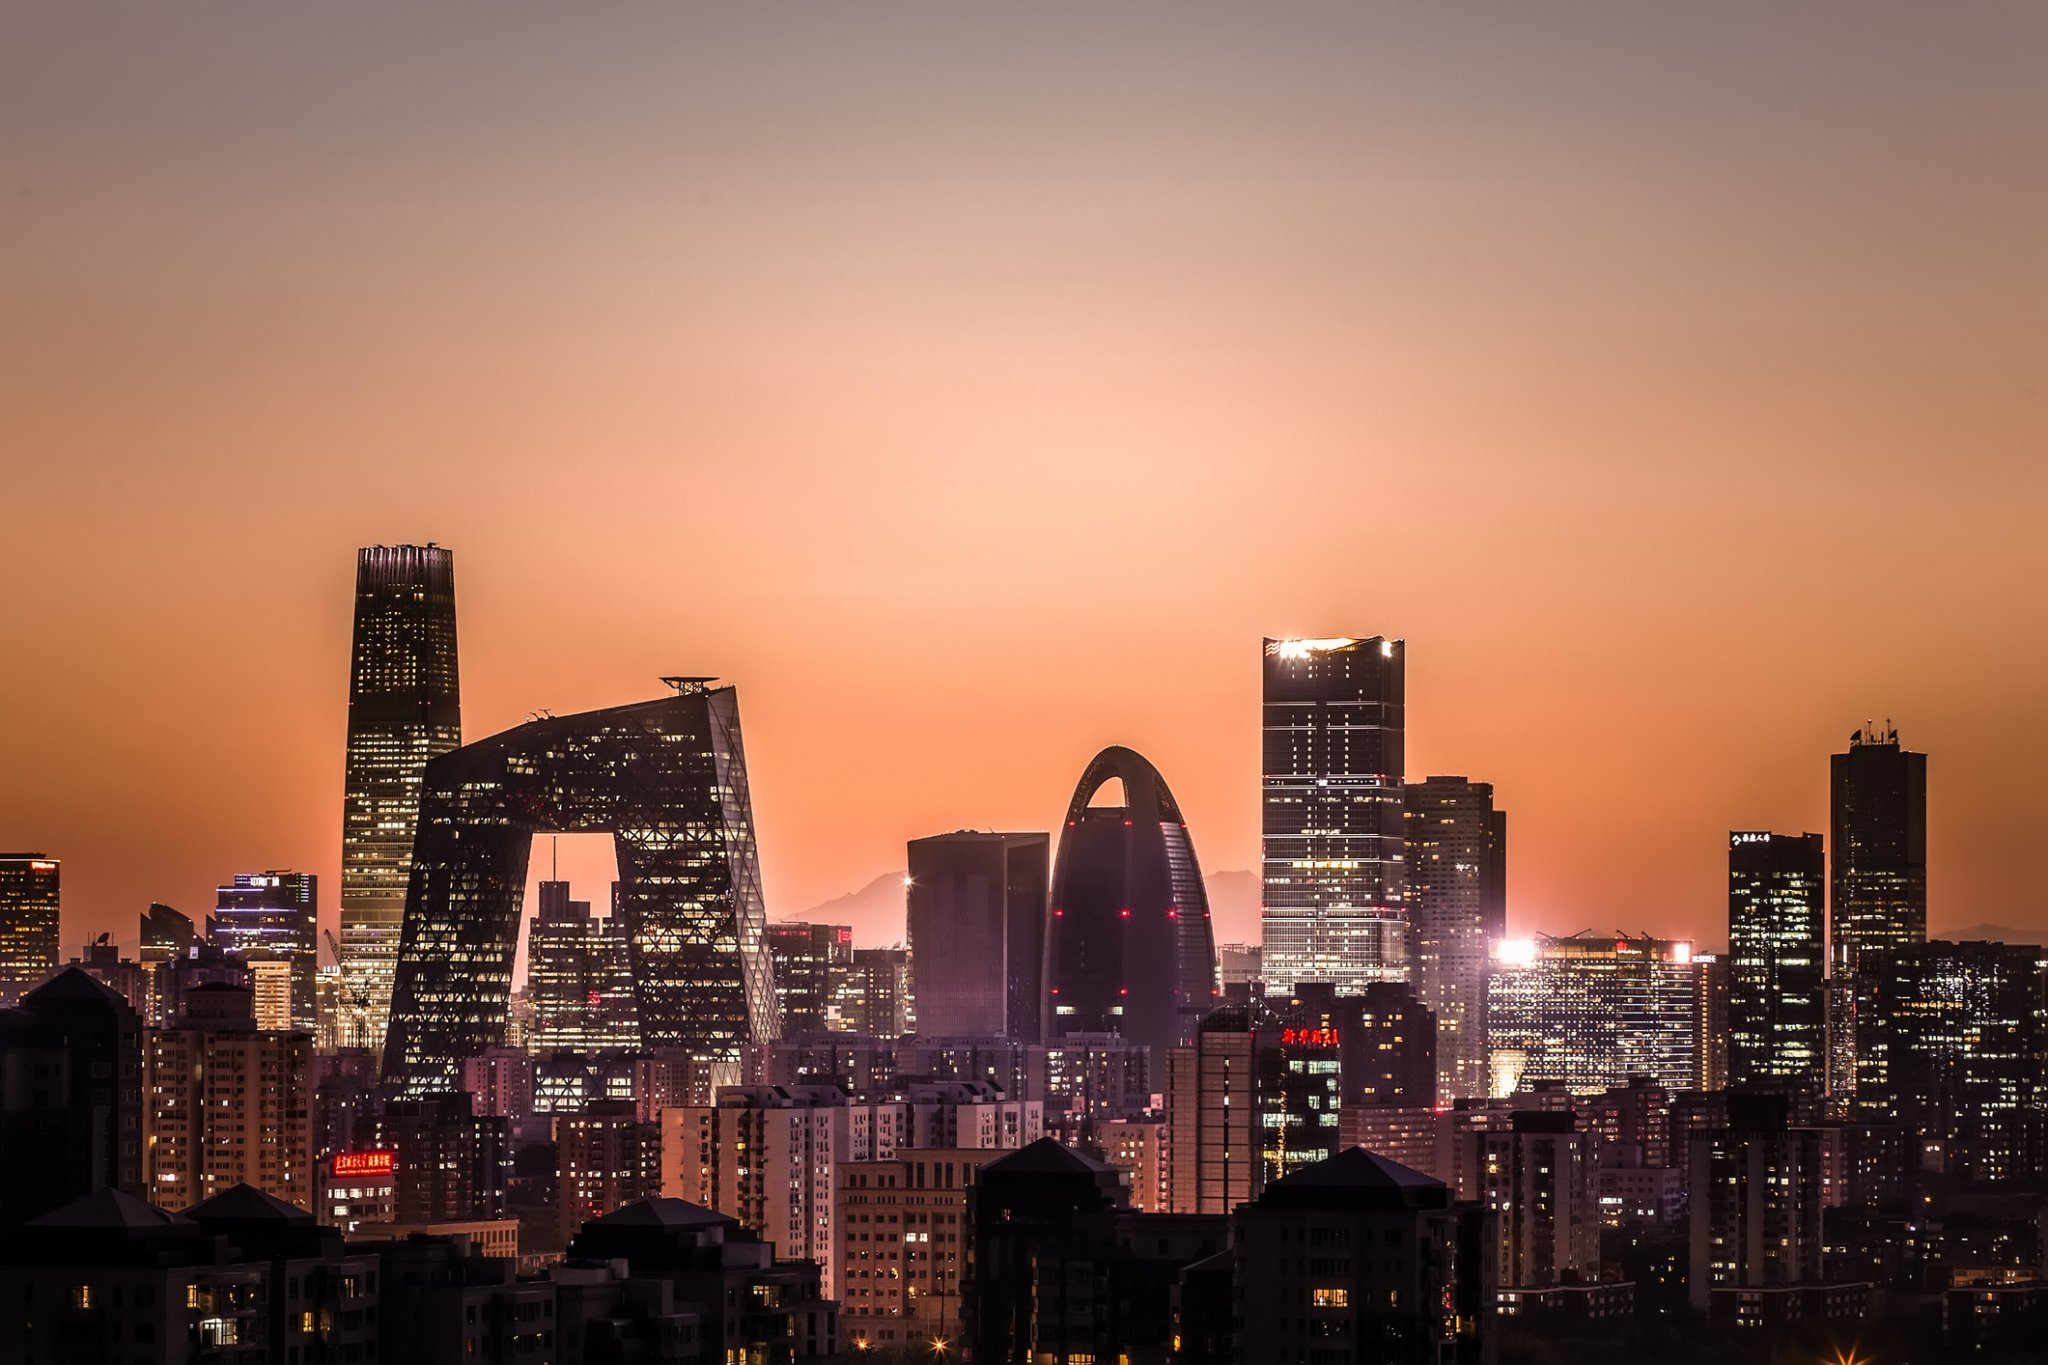 Accelerating fintech in China https://t.co/bY9ckrFpJB https://t.co/BAG7rw1oAt